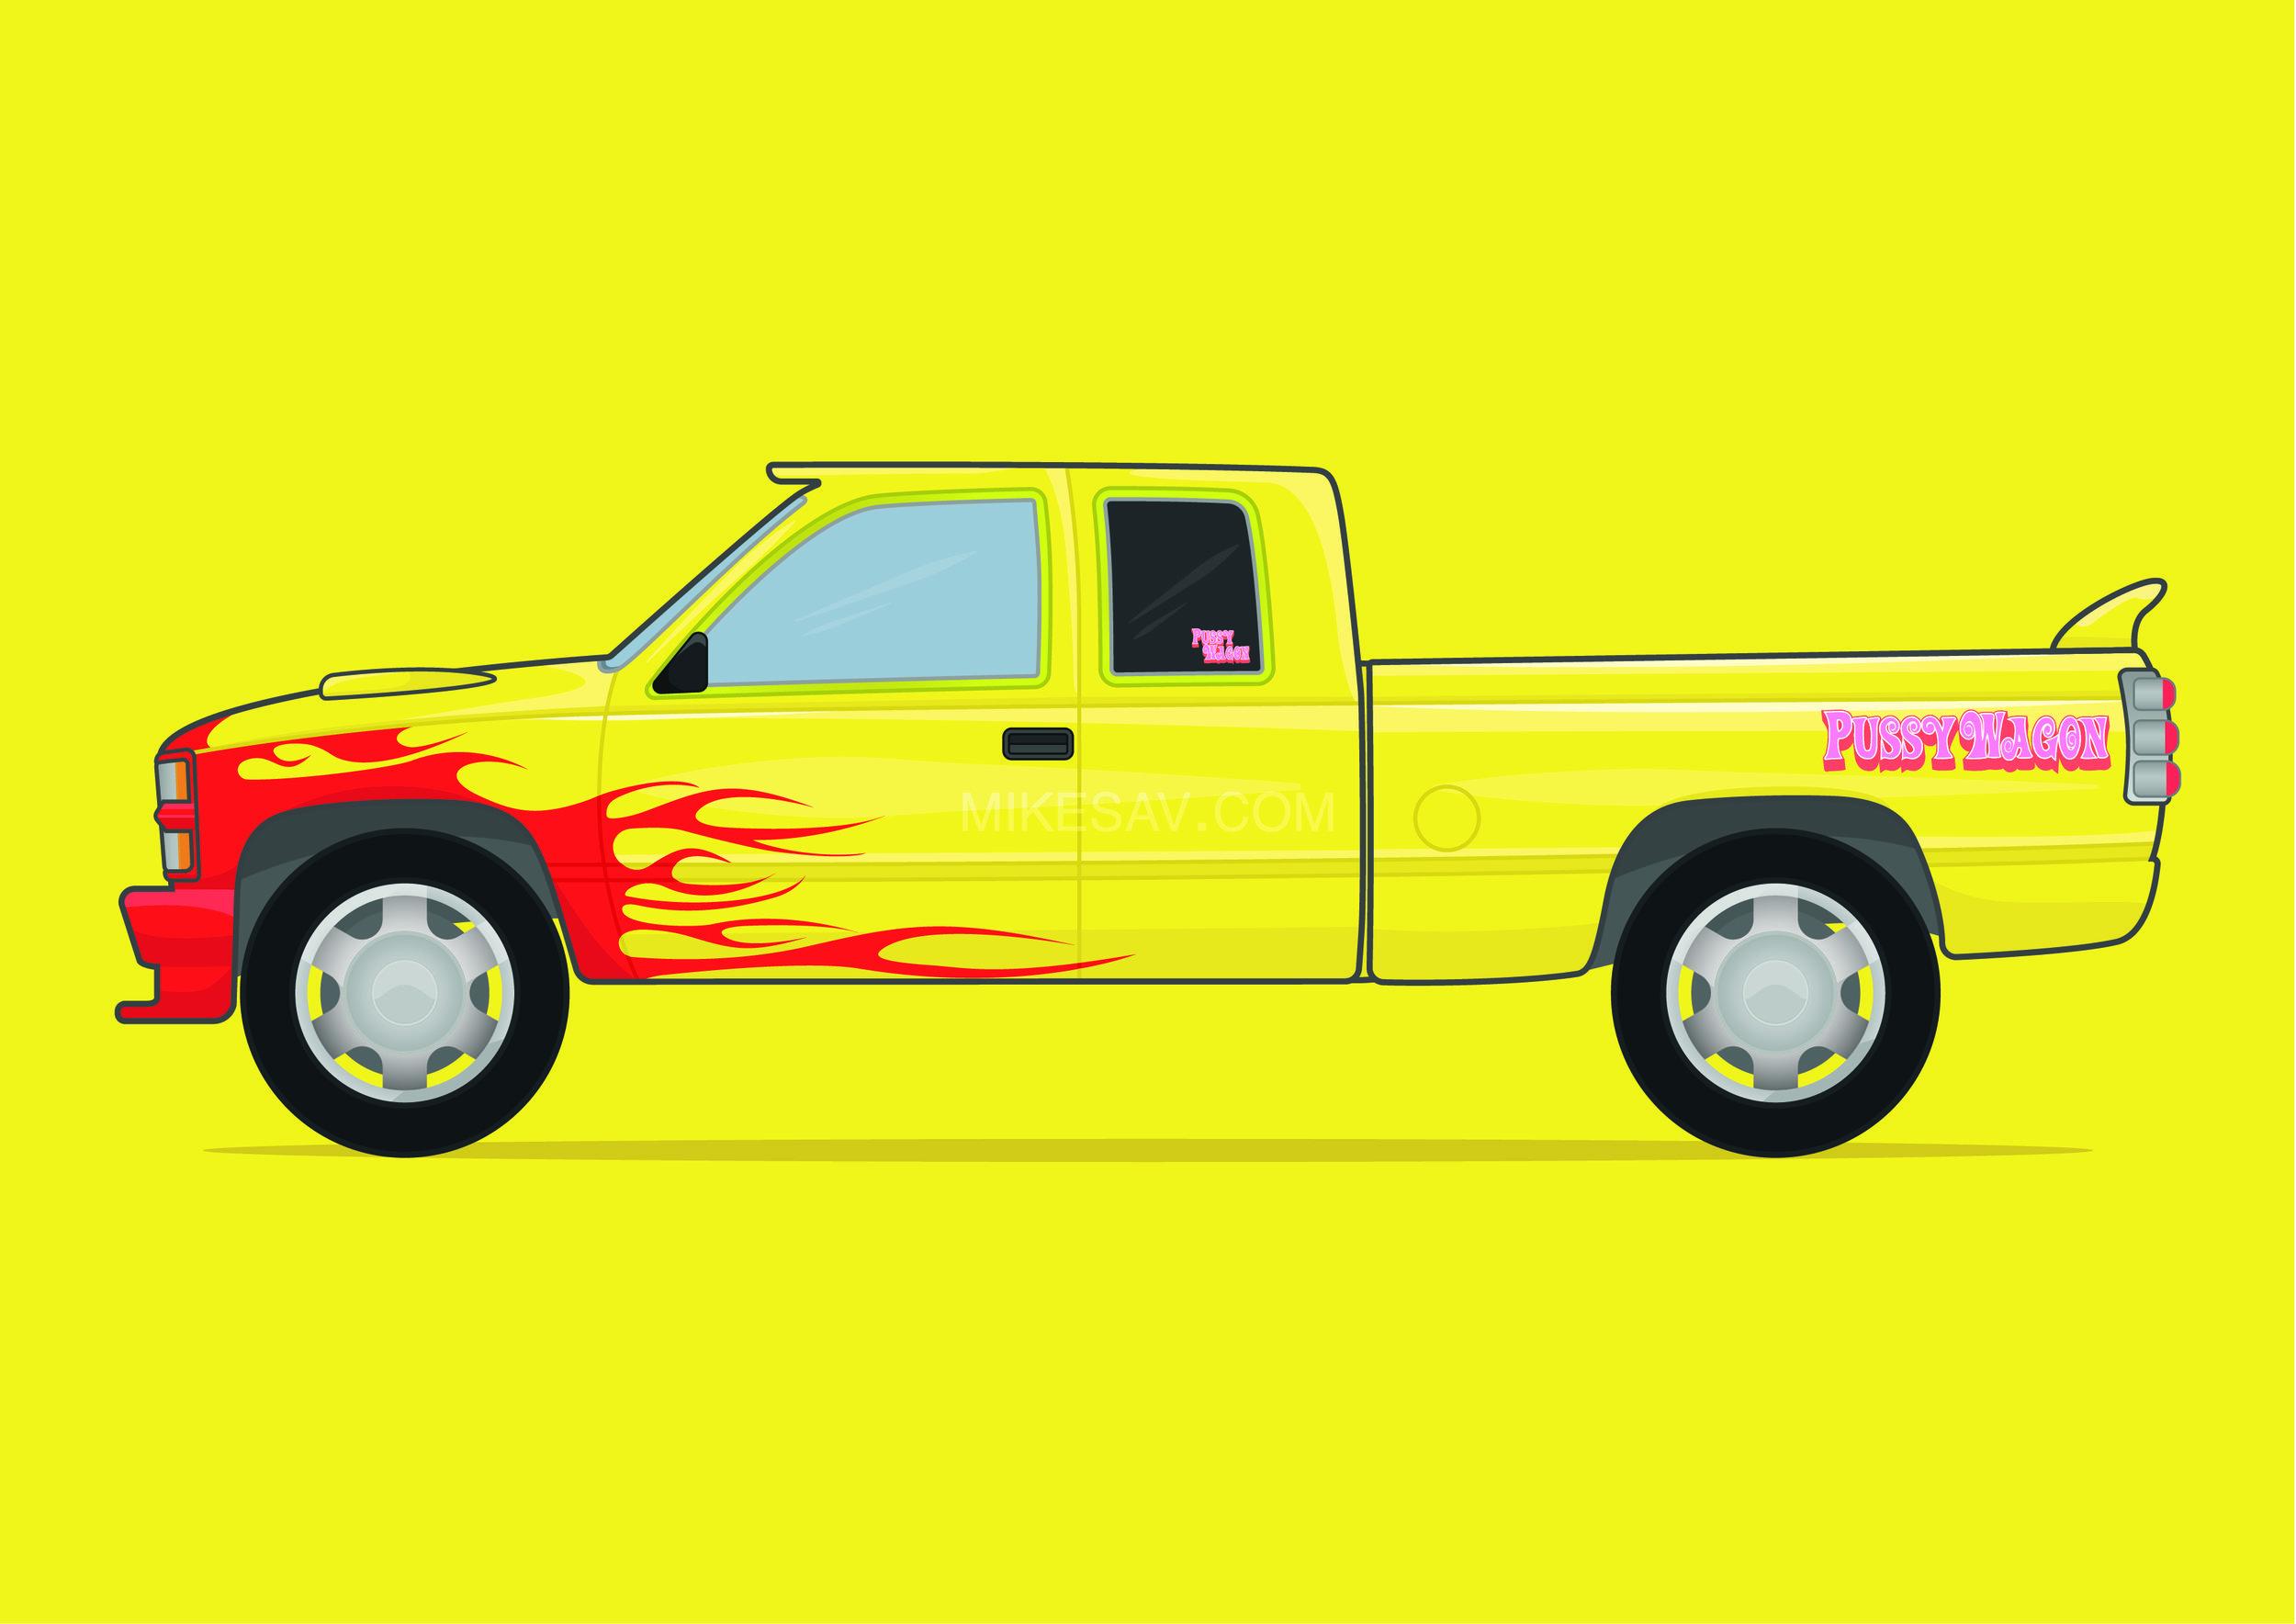 Chevrolet Silverado (Pussy Wagon) / Kill Bill (2003) / Director: Quentin Tarantino